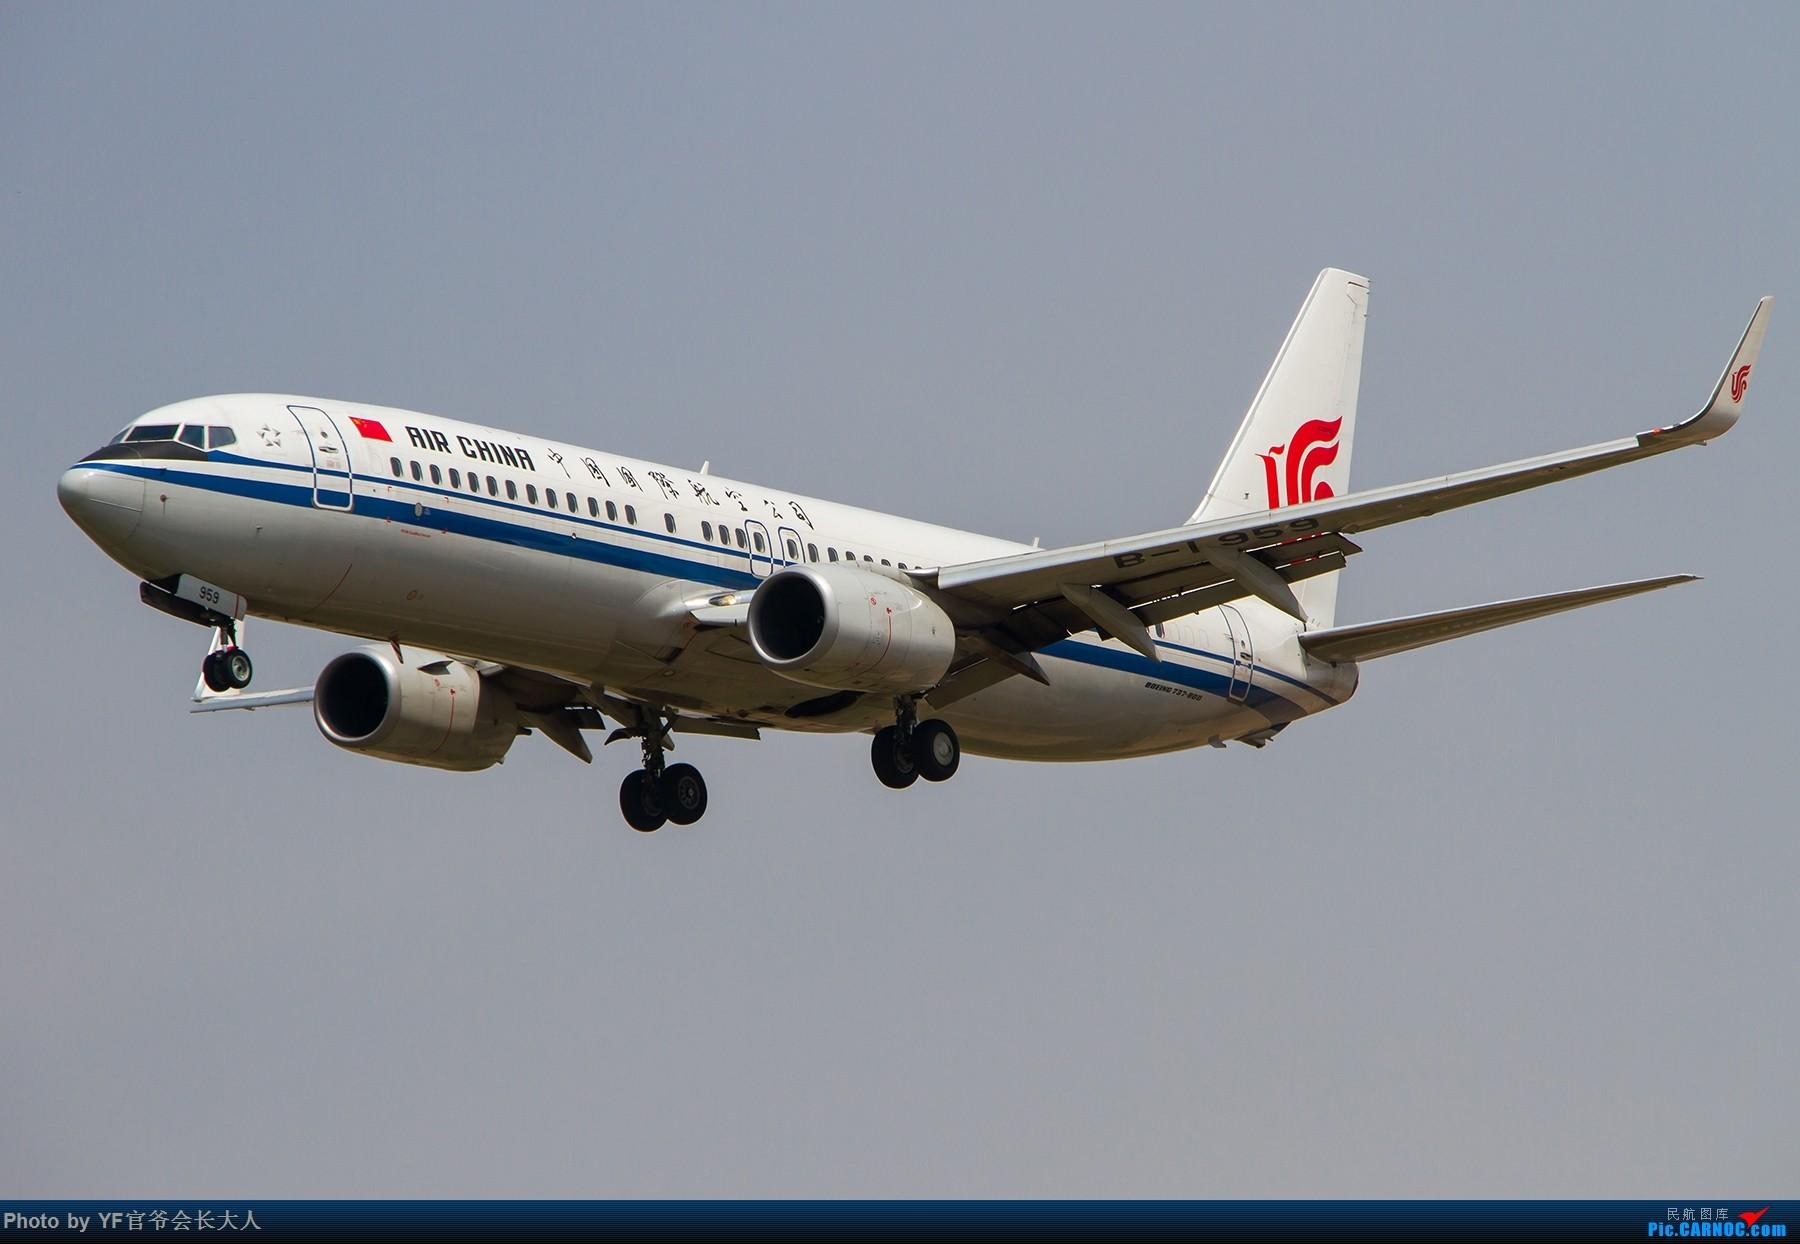 Re:[原创]【ZYTX】轻易不拍机,拍就要拍个过瘾!(新开的酷鸟,亚洲大西洋,顺带碰上朝韩两国的好货) BOEING 737-800 B-1959 中国沈阳桃仙国际机场